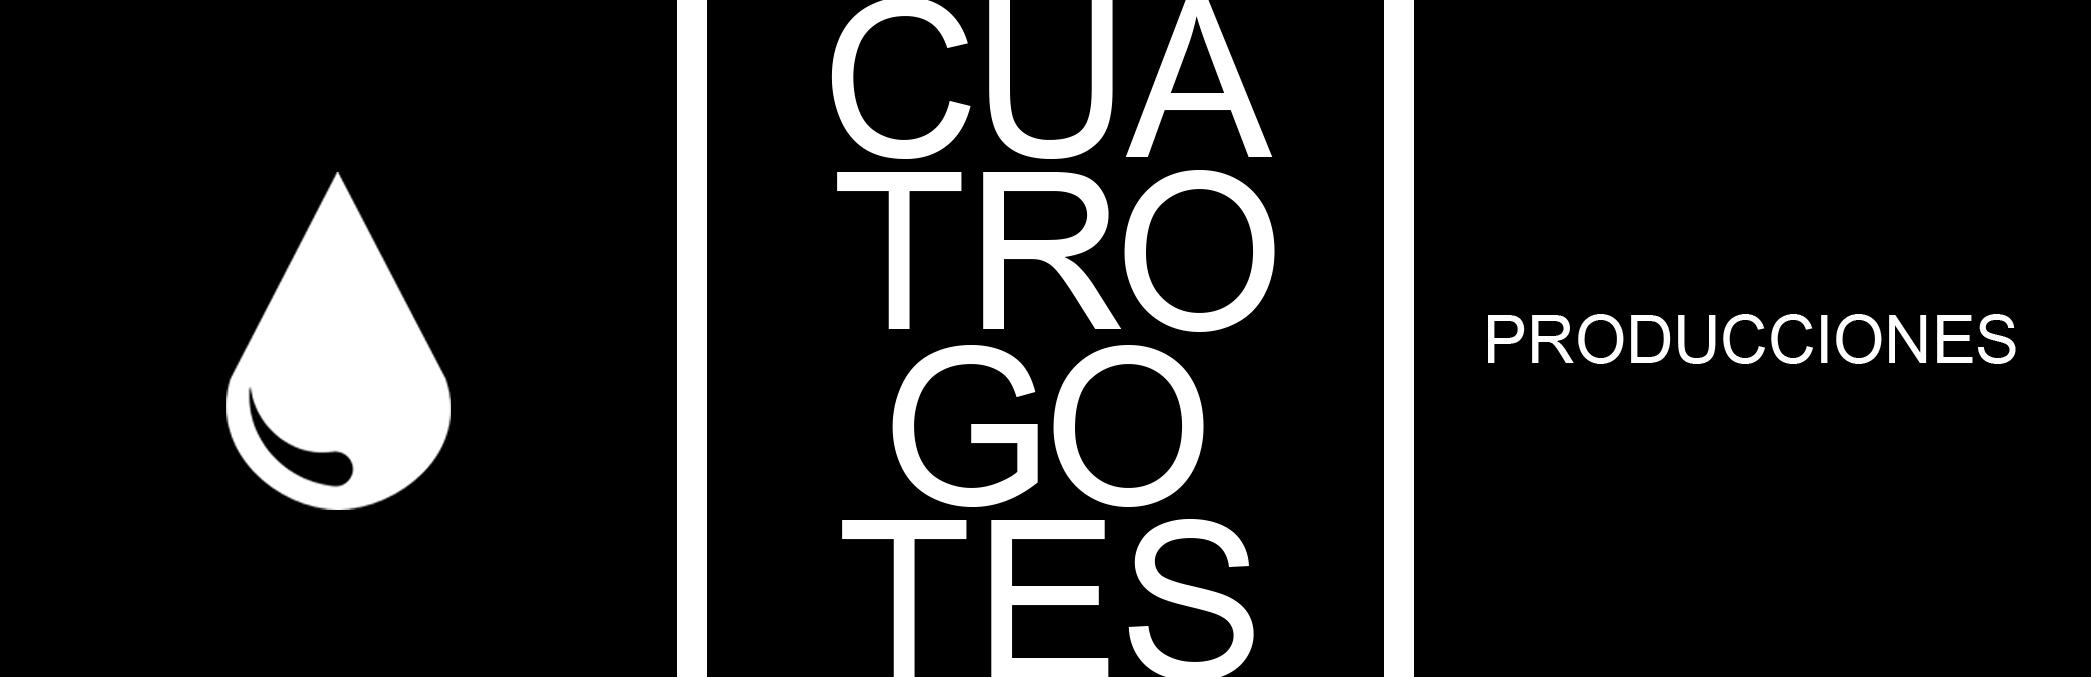 CuatroGotes